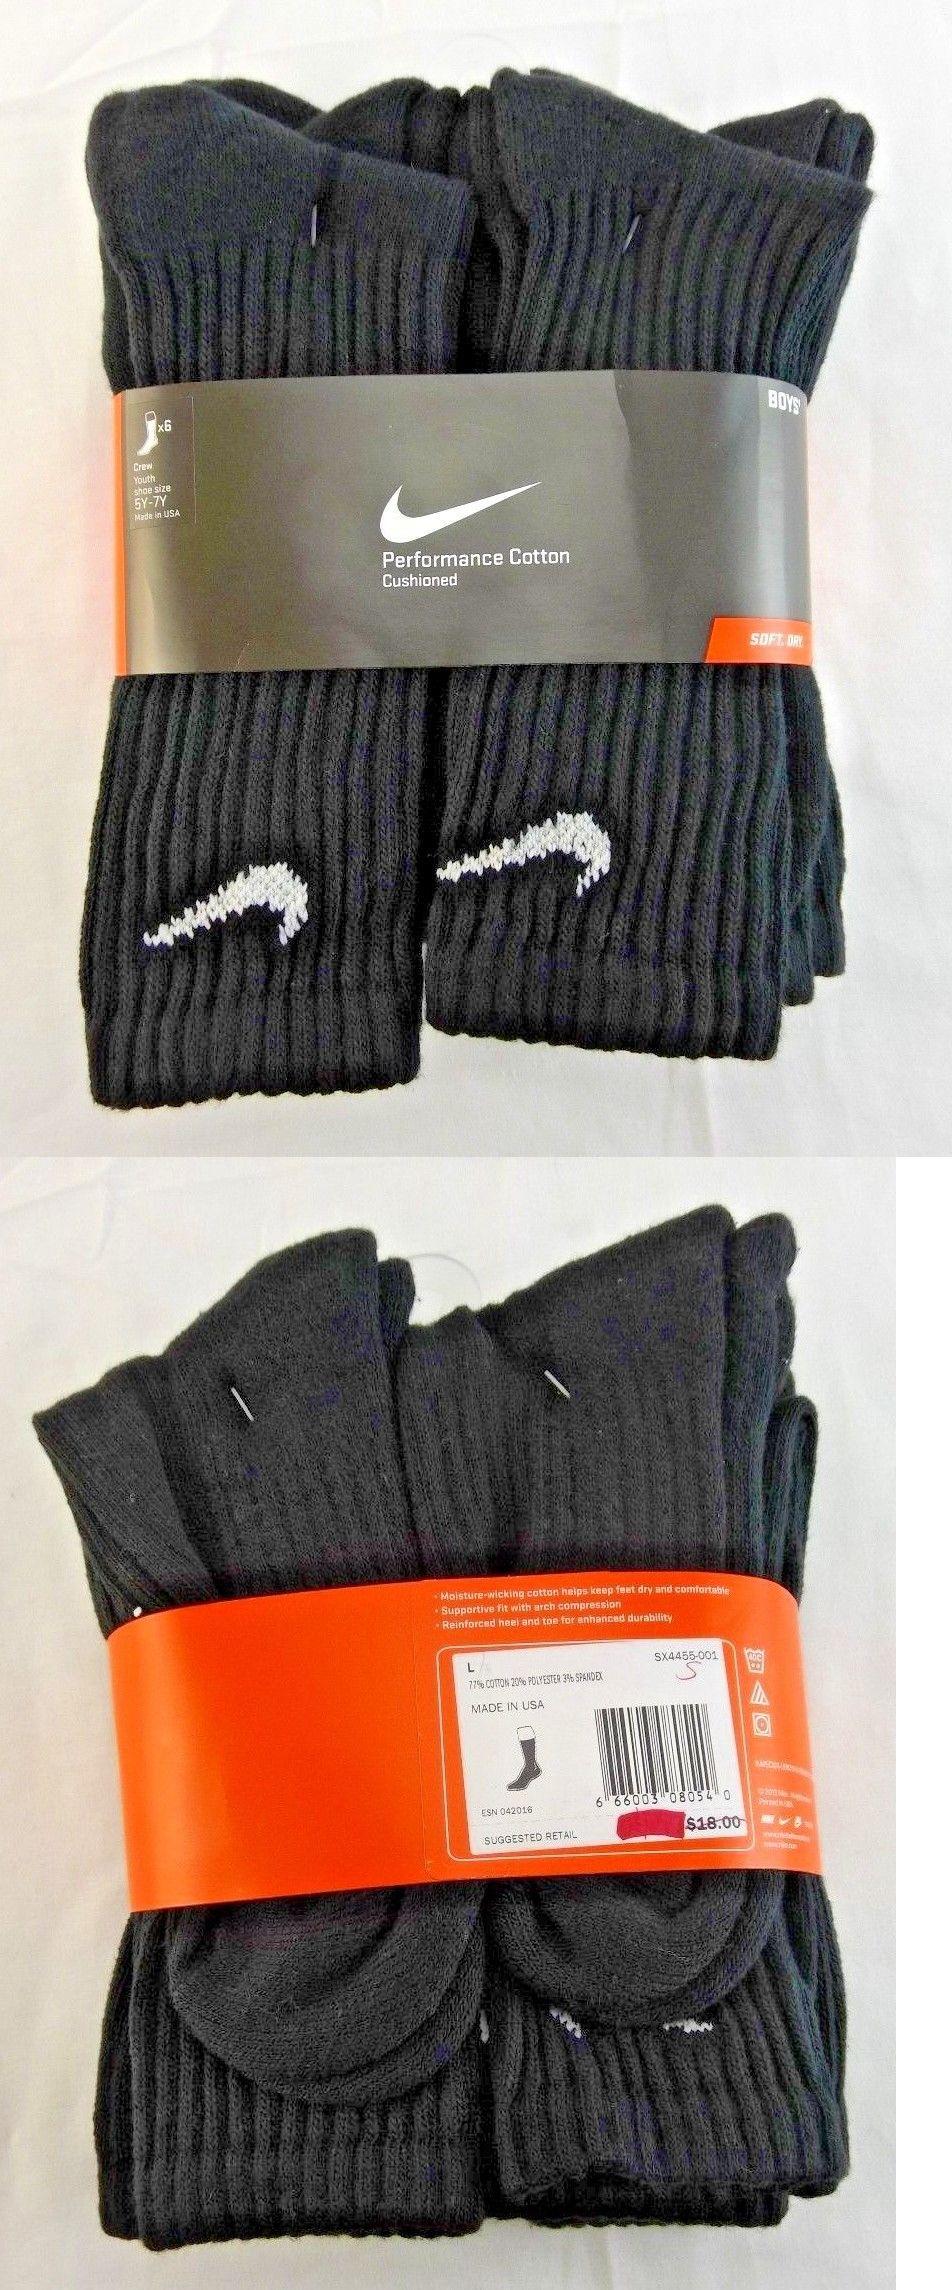 Socks 153564: Boys Nike Performance Cushion Crew Sock (6 Pair